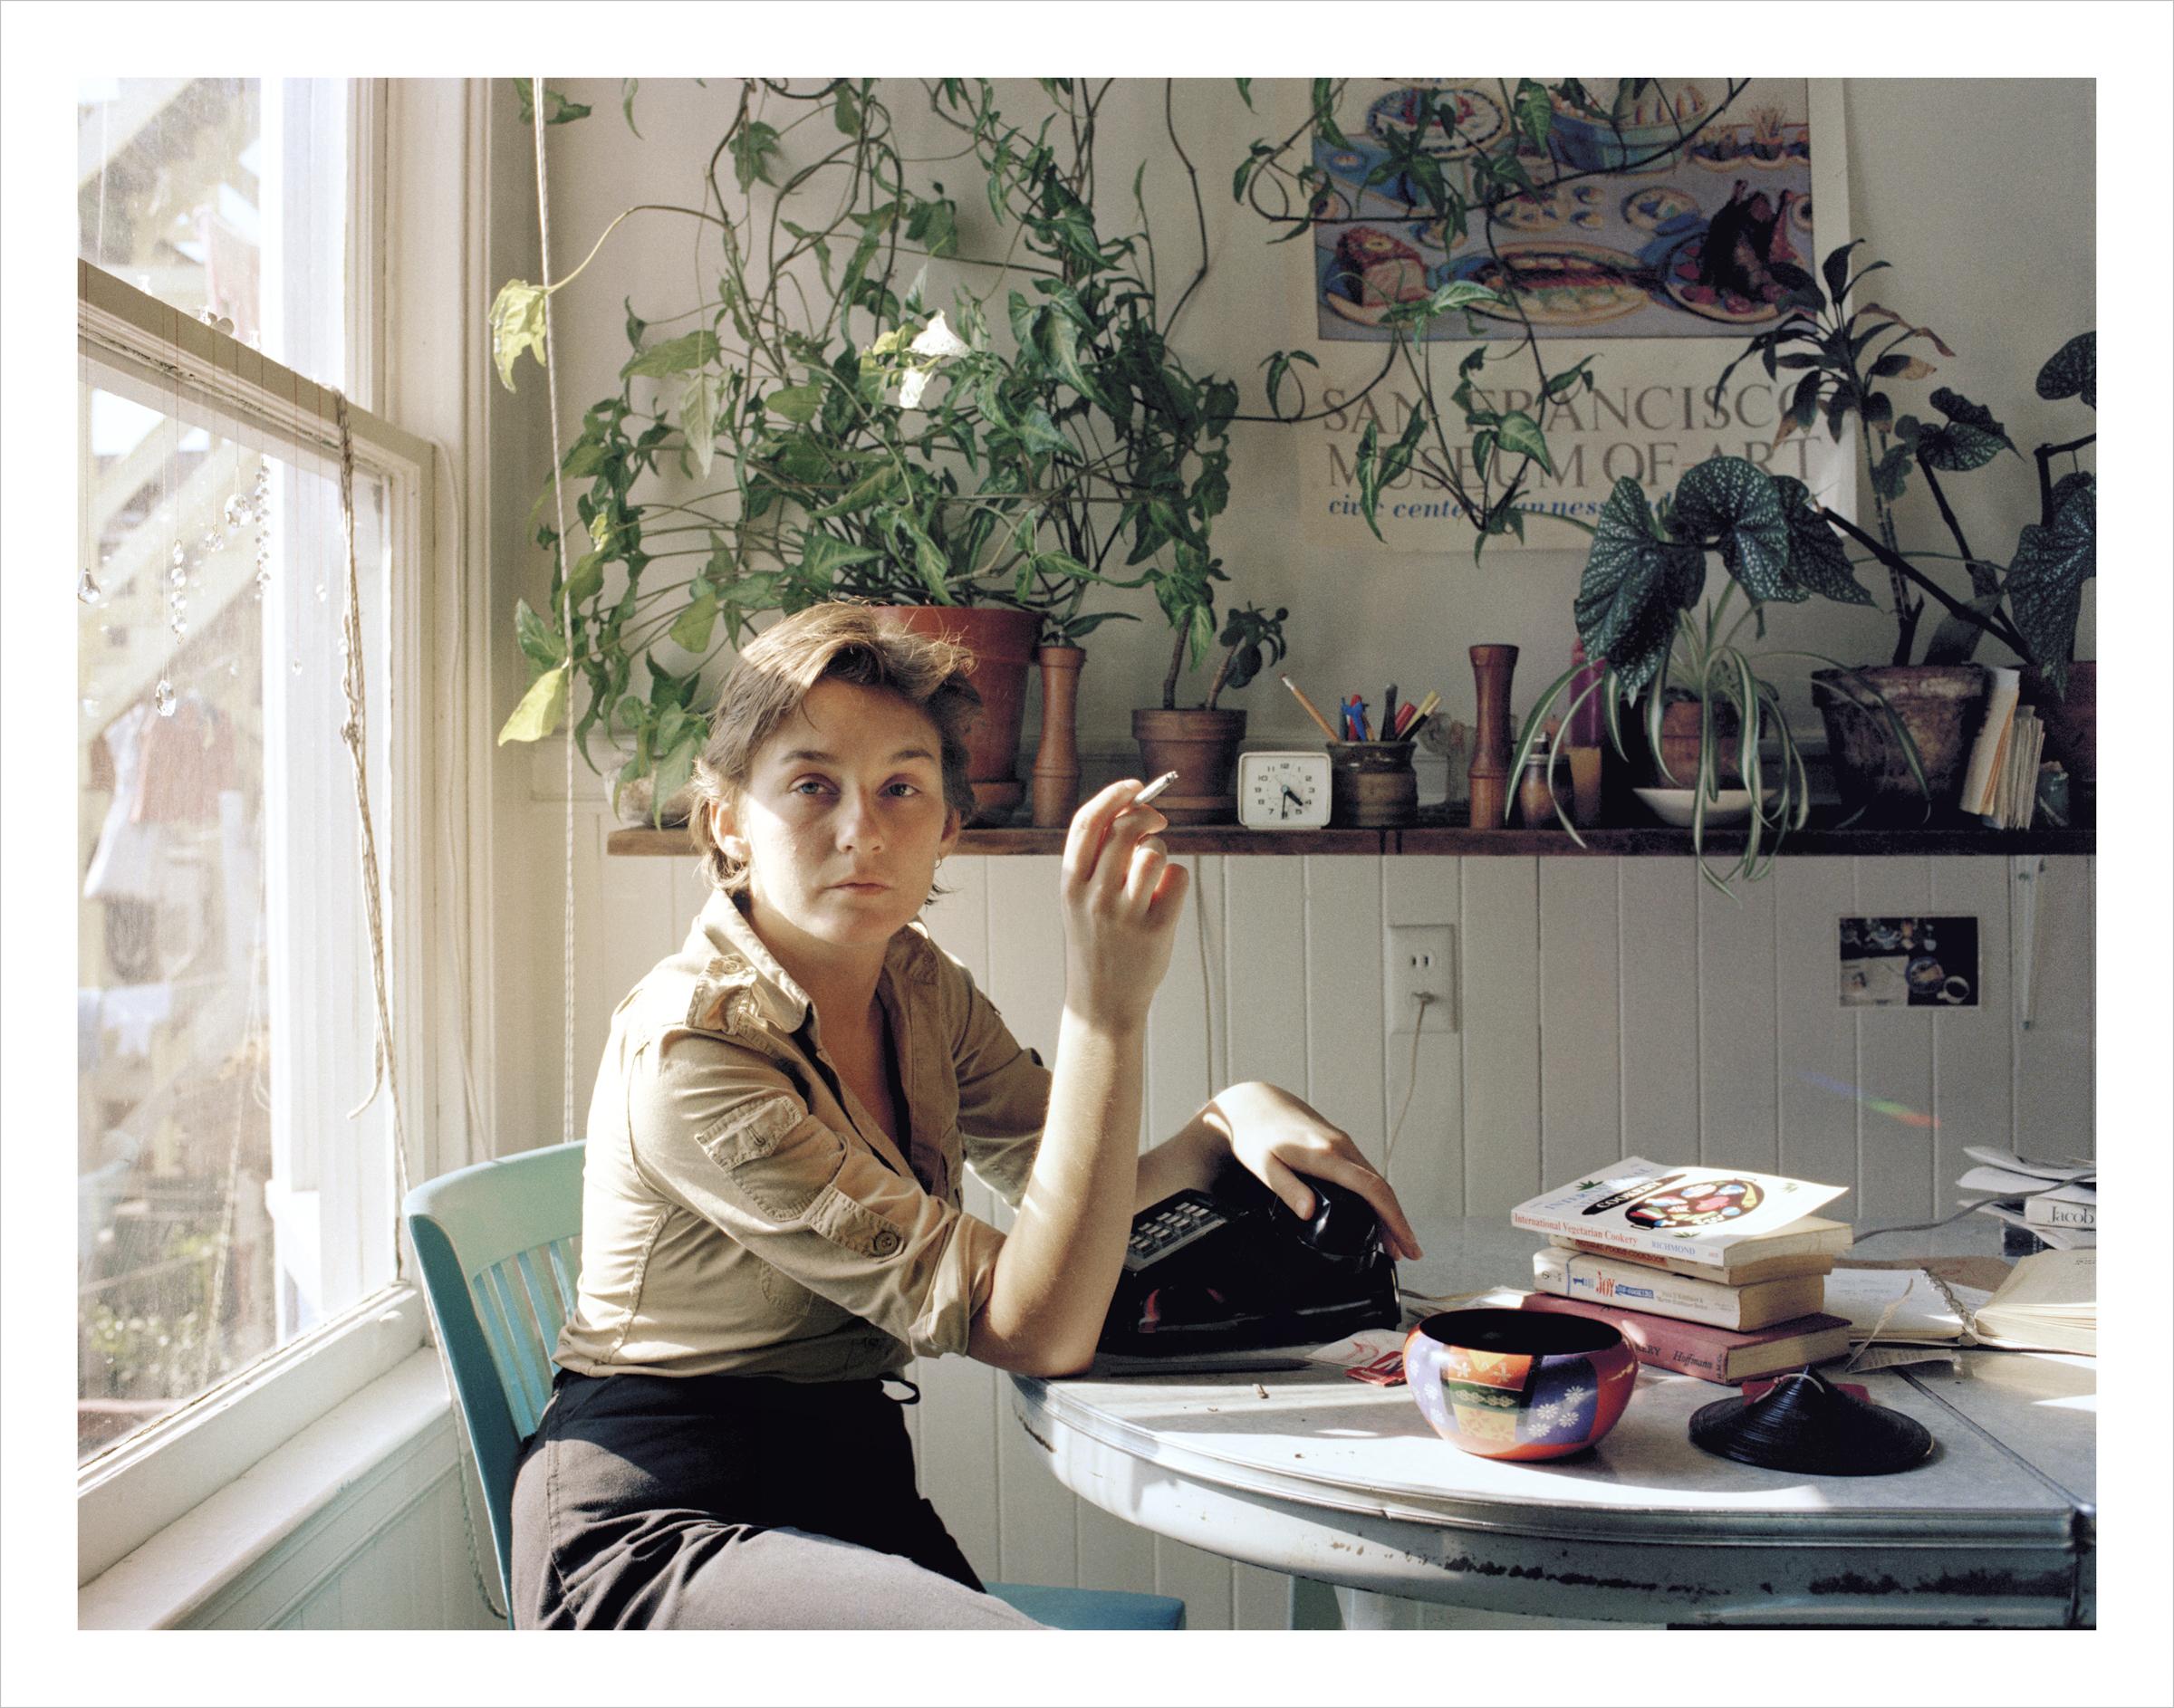 Laura Graham, 62 Langton Street, 1979 Archival Pigment Print, 2016 16 x 20 inches, edition of 5 20 x 24 inches, edition of 2 30 x 40 inches, edition of 2